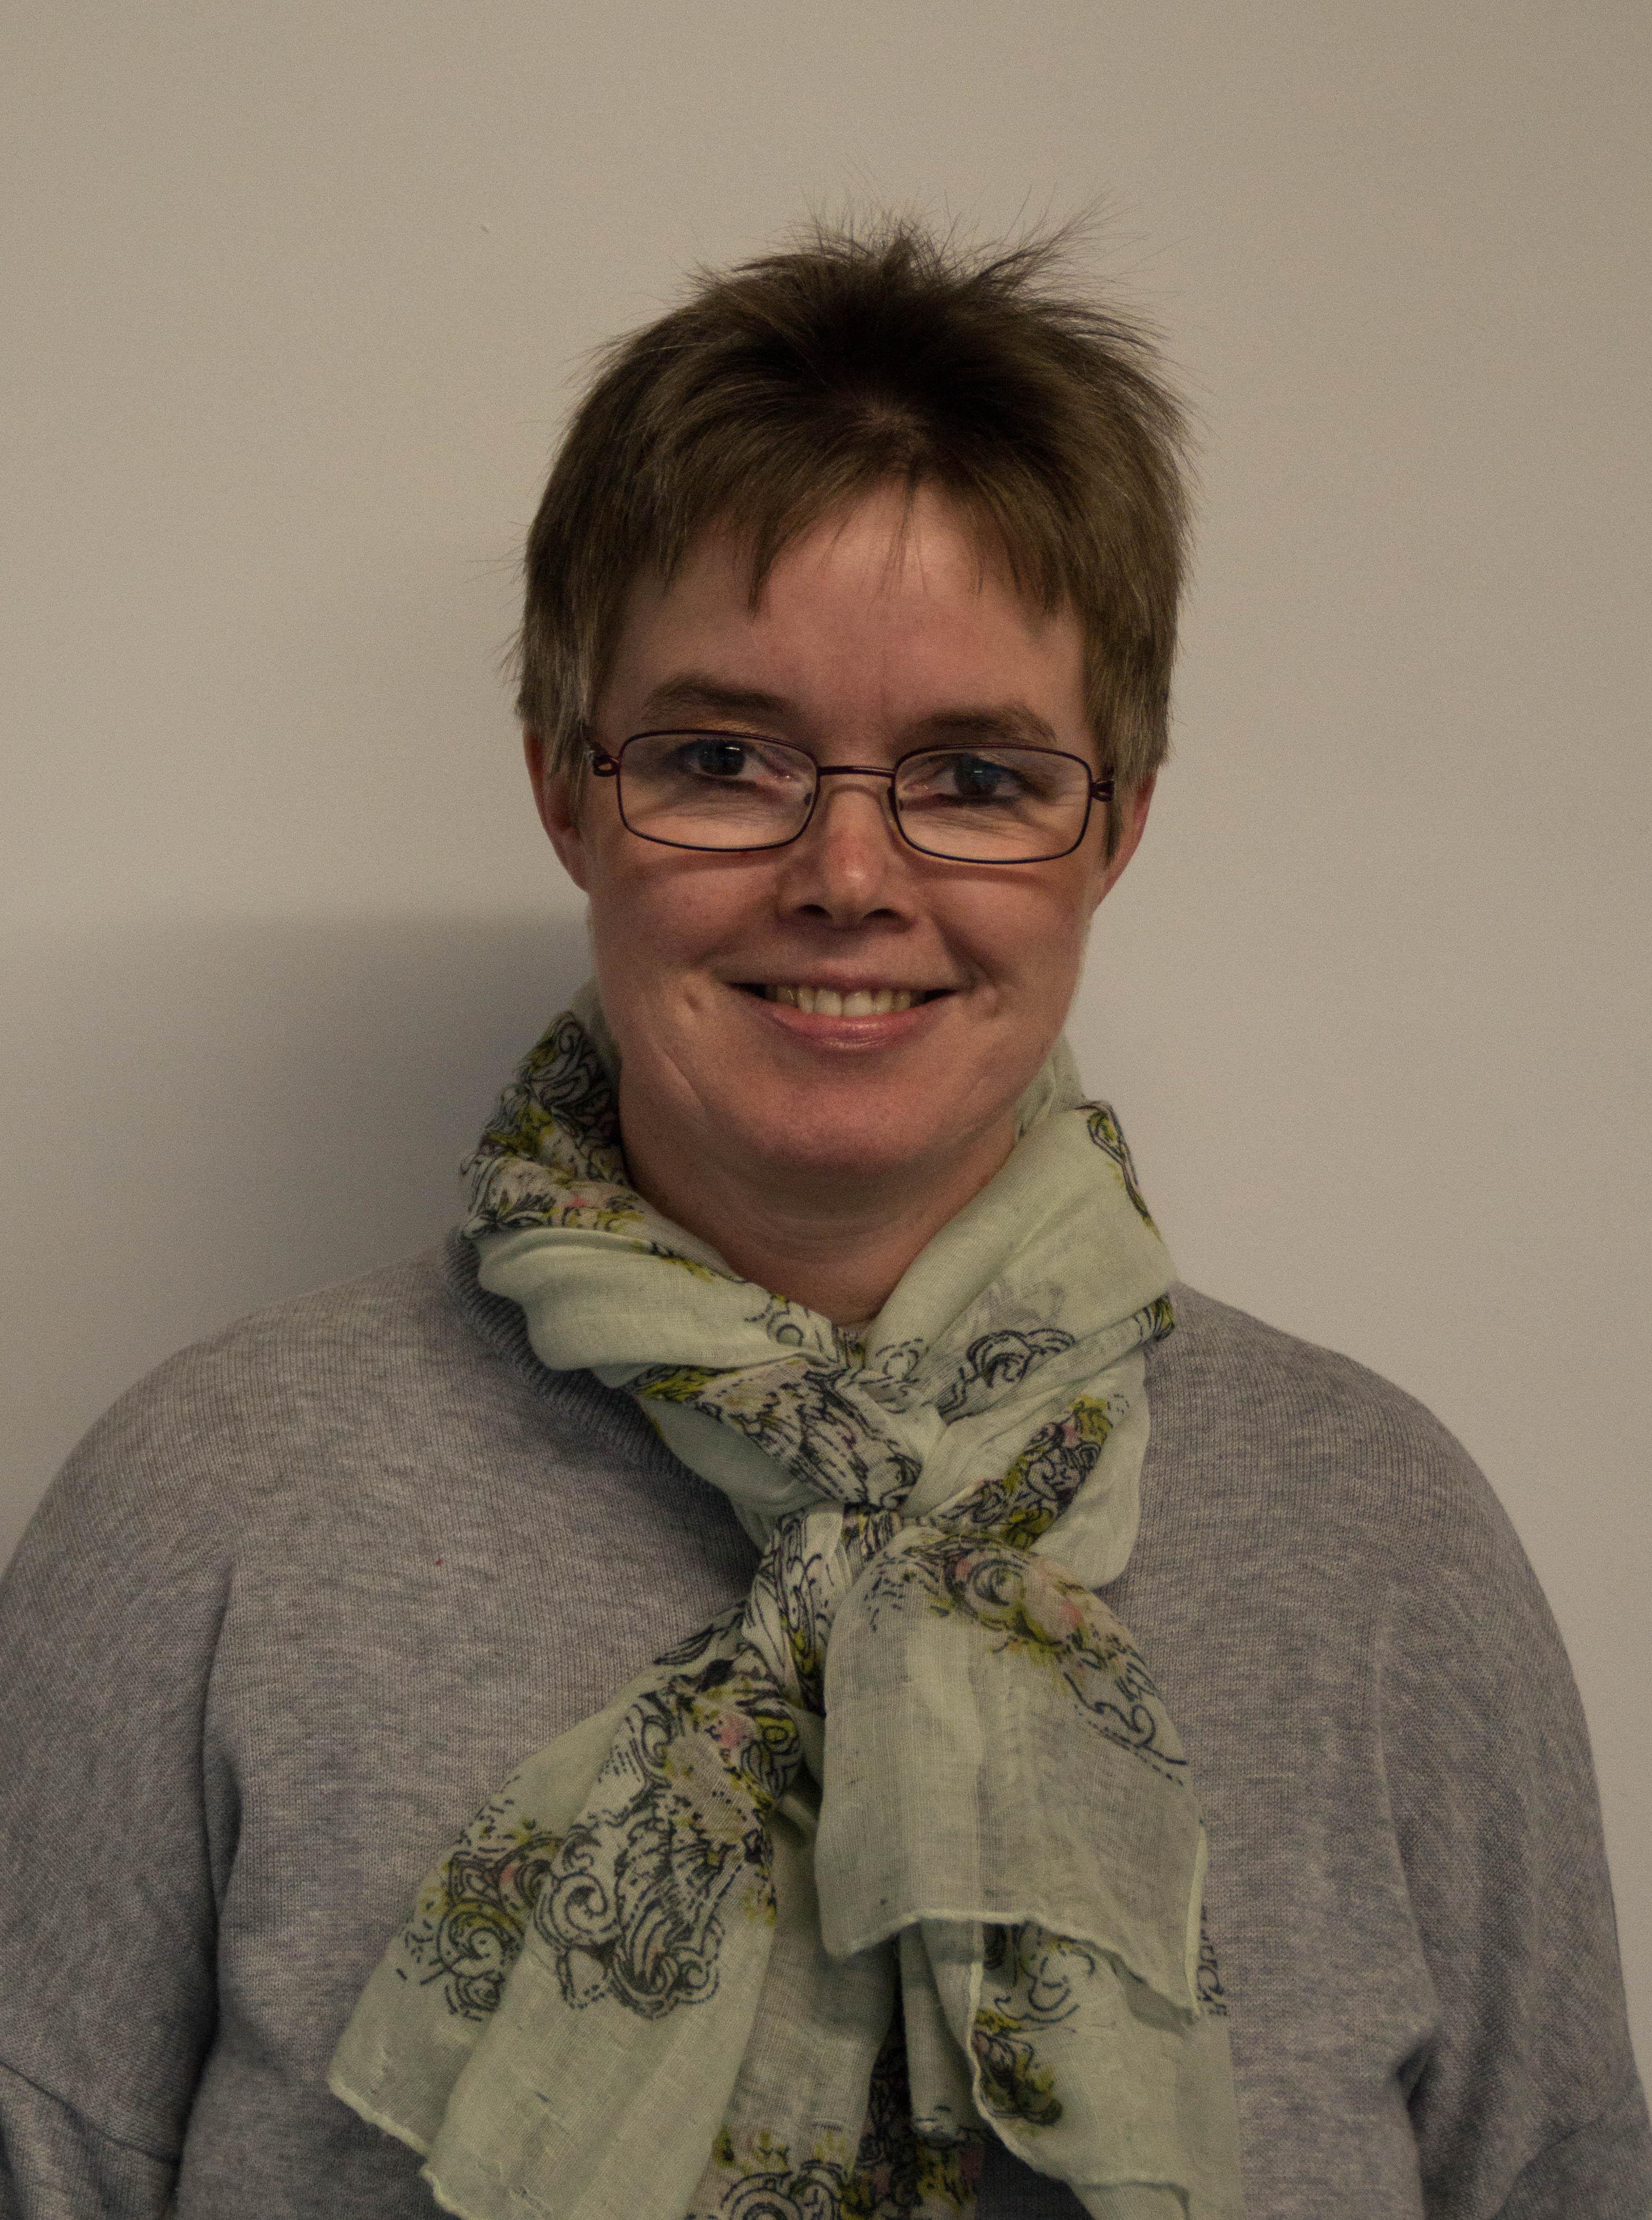 Patricia van Gend